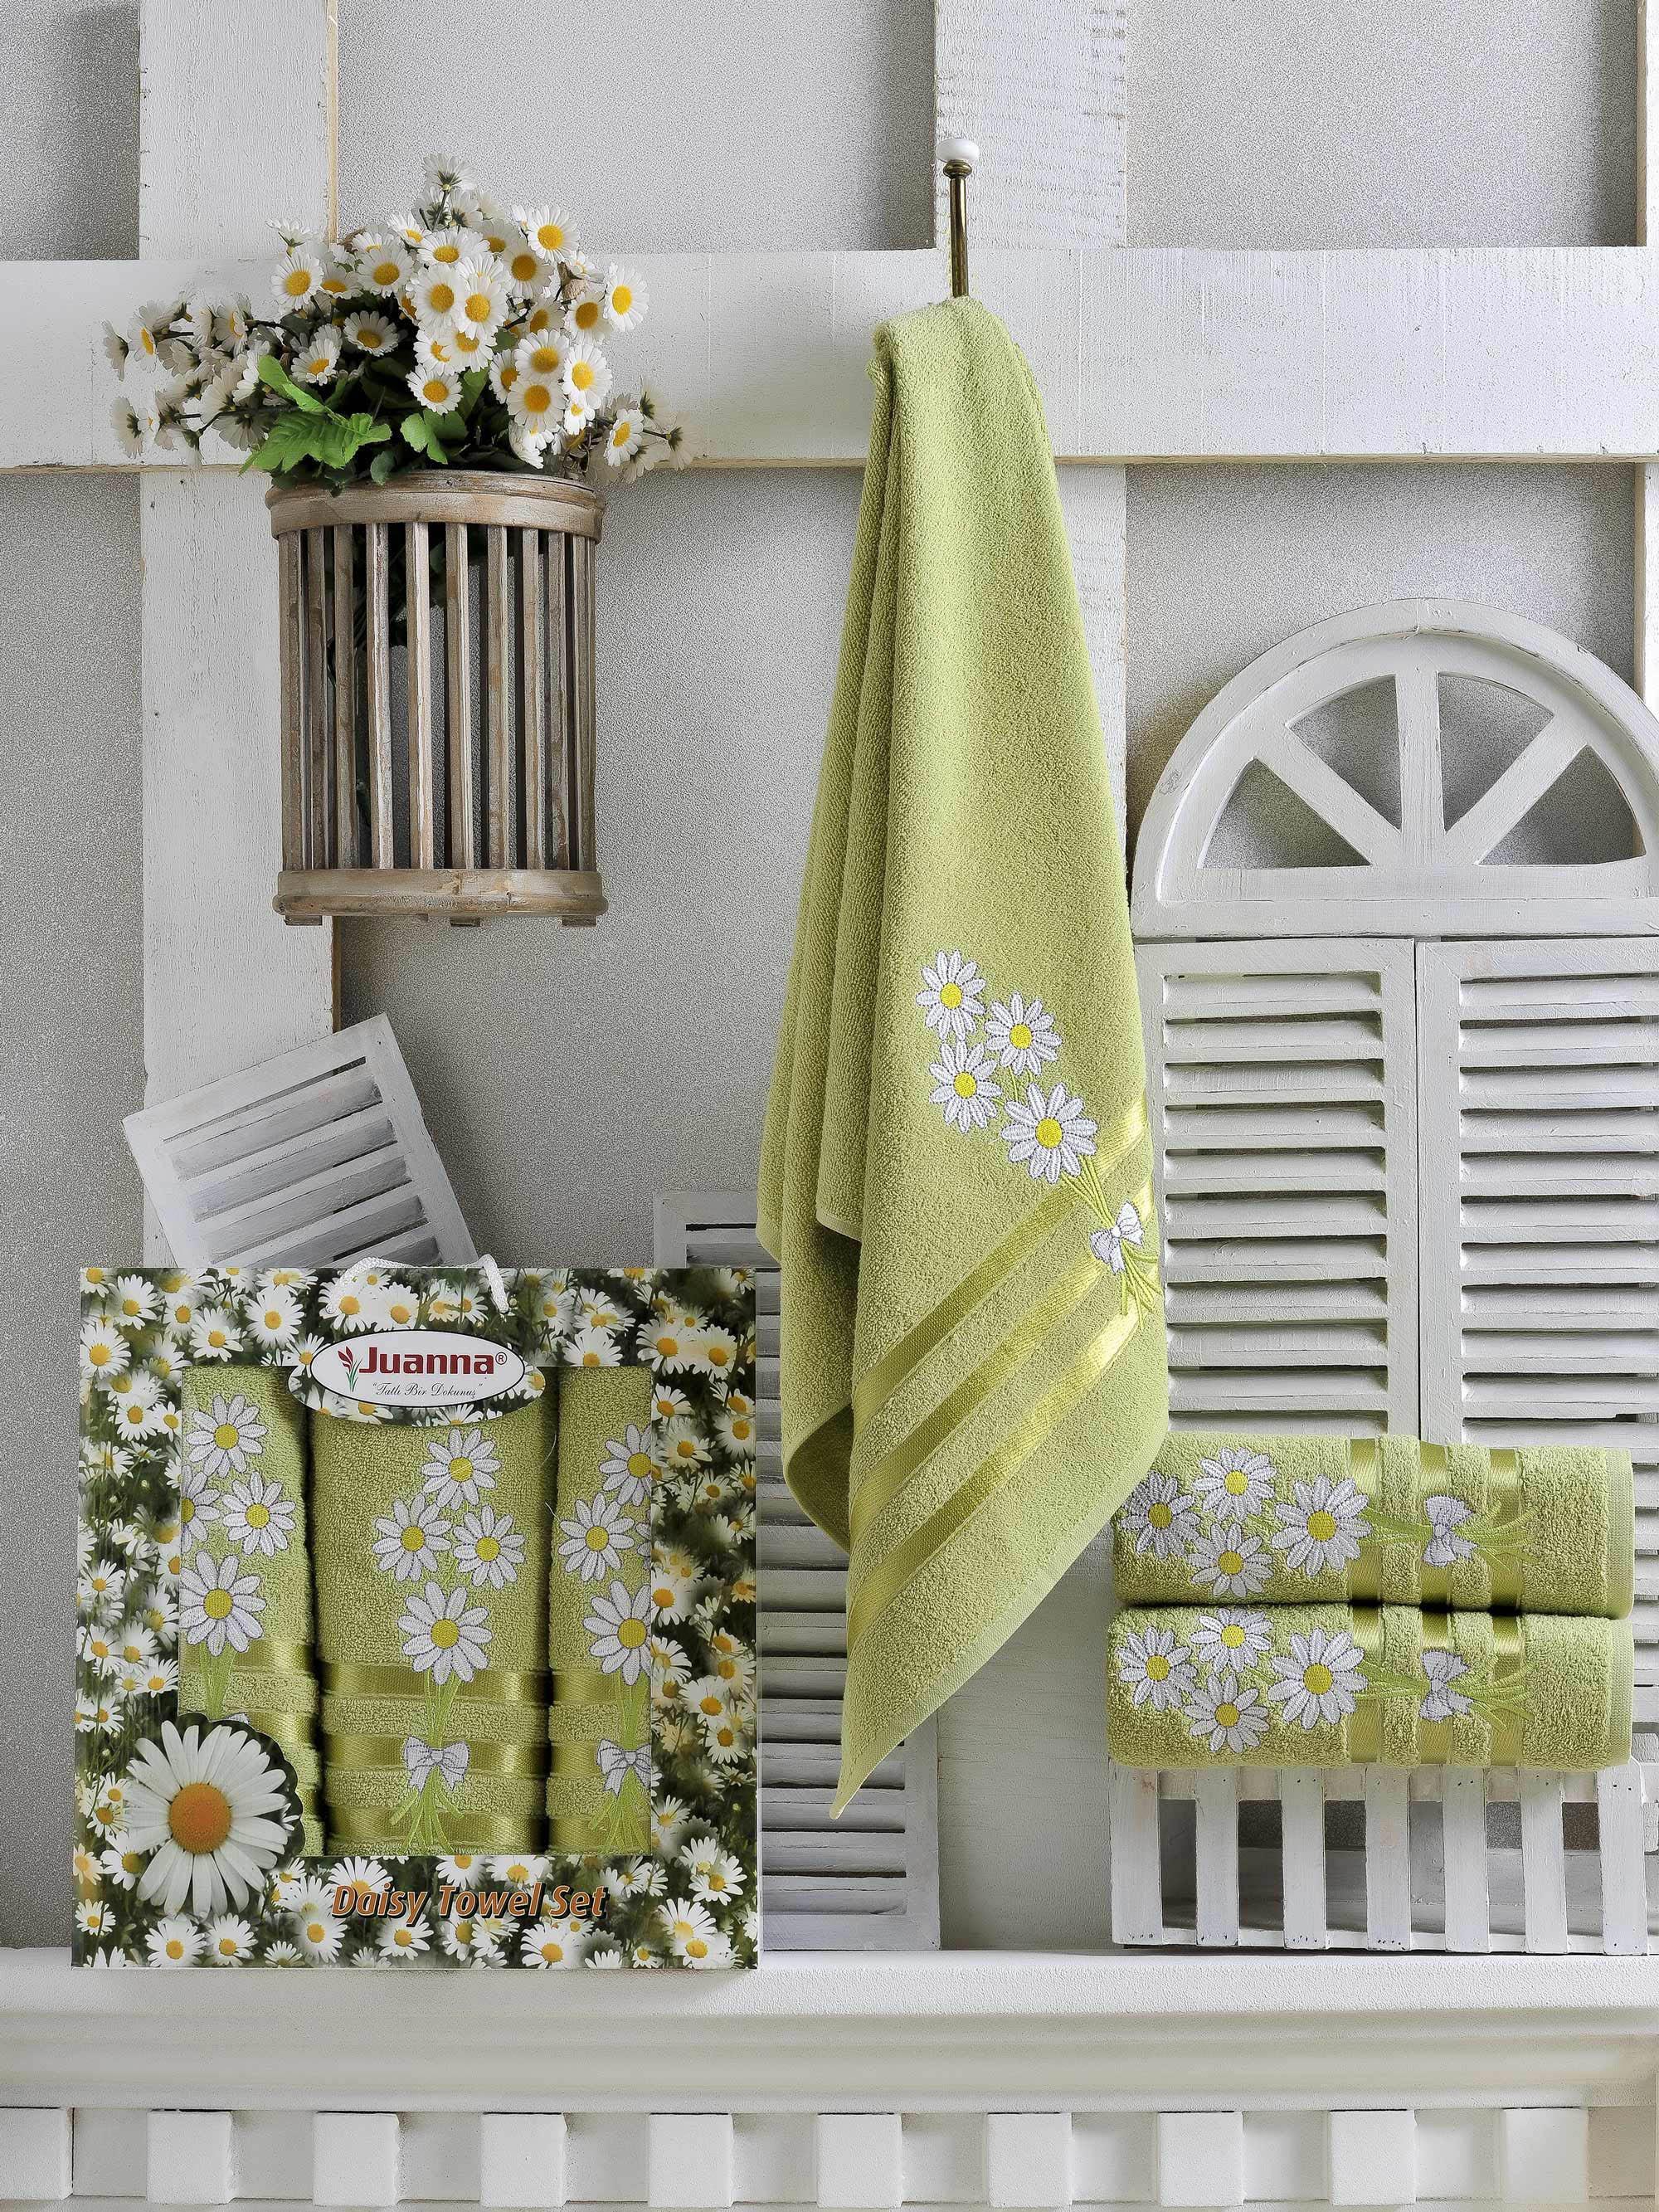 Полотенца Juanna Набор из 3 полотенец Papatya Цвет: Зелёный набор из 3 полотенец merzuka sakura 50х90 2 70х140 8432 терракотовый